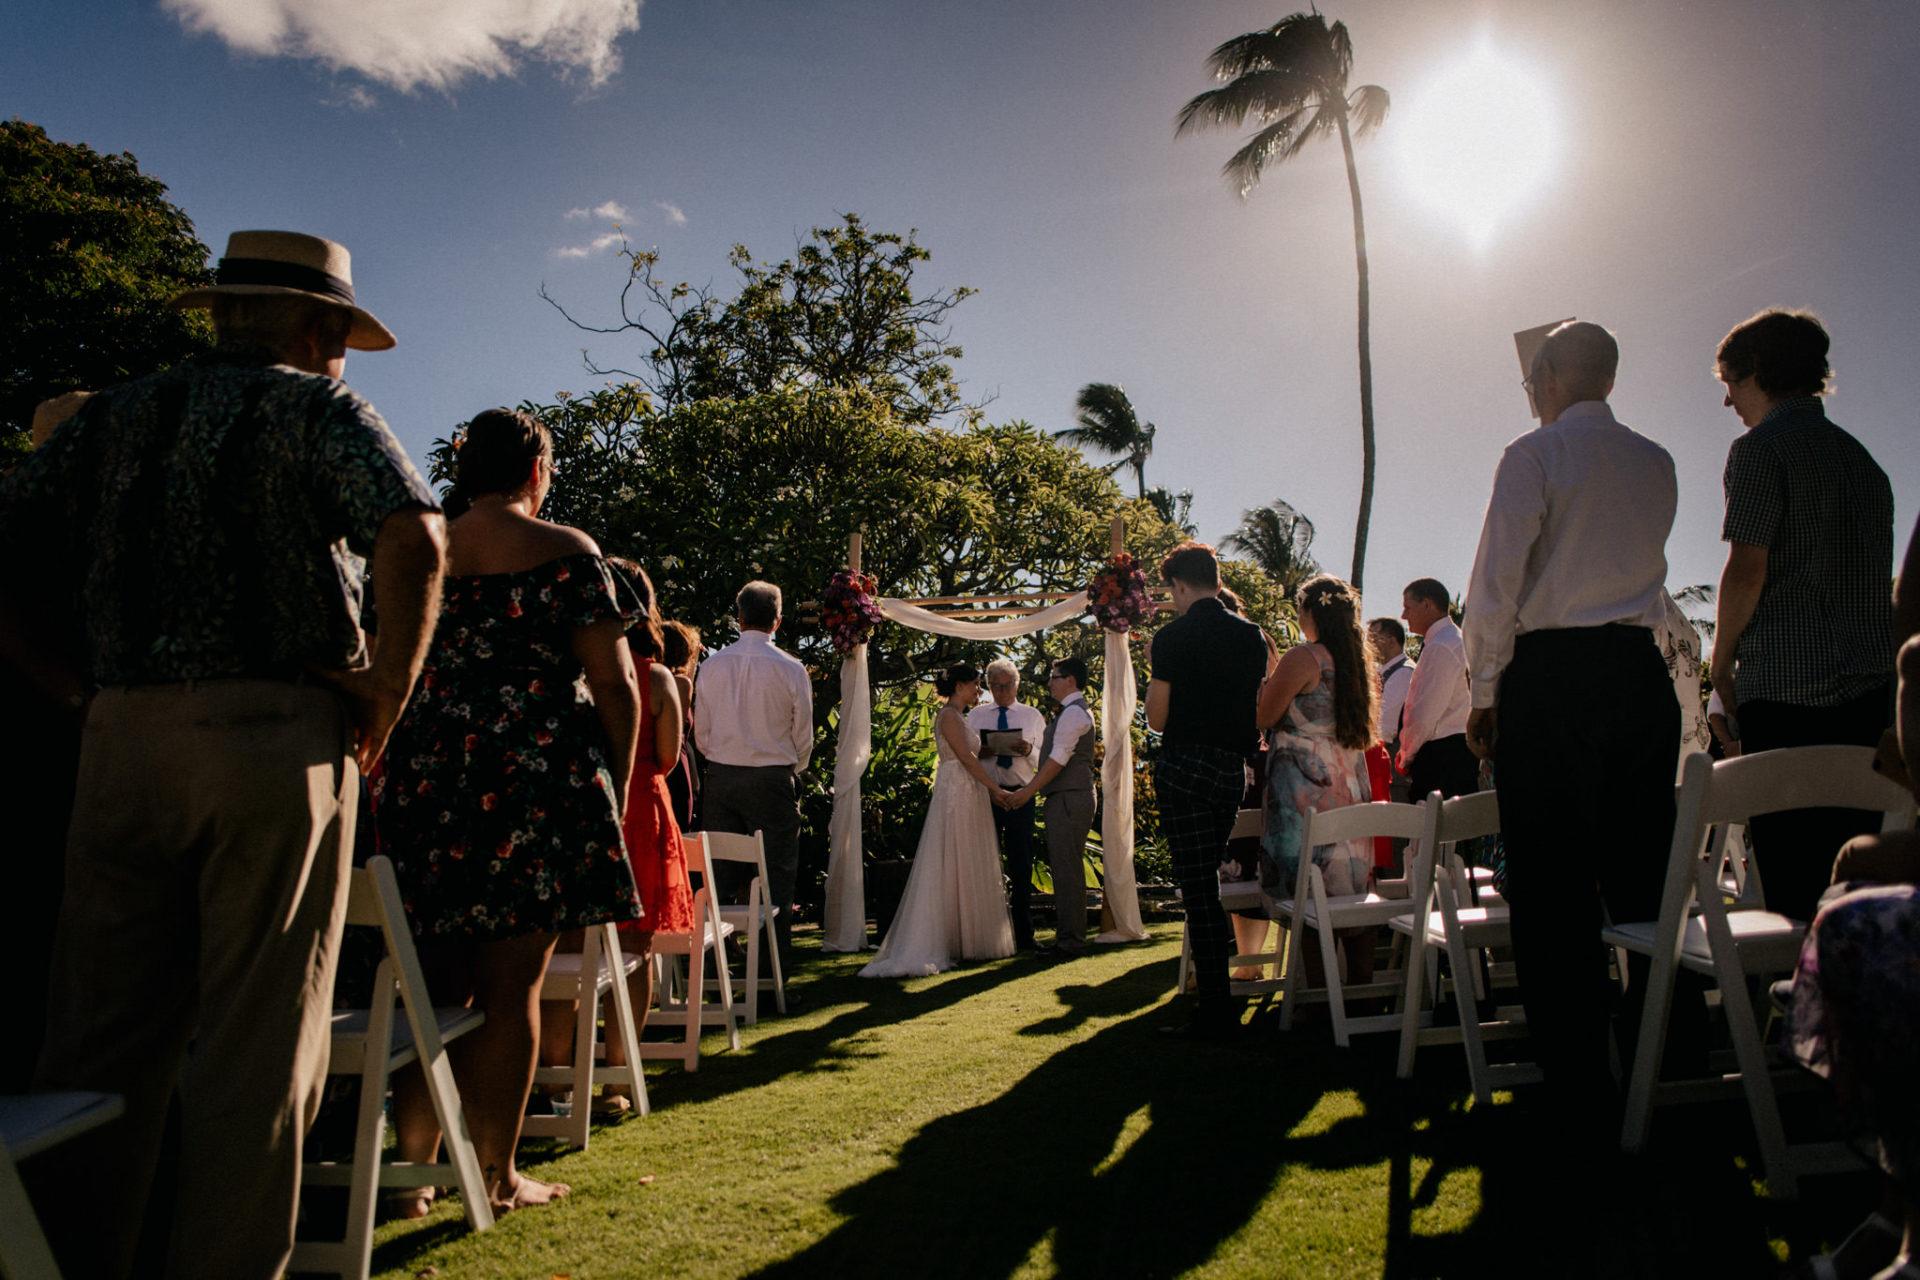 Hawaii Hochzeit-destination wedding kauai-Plantation Gardens Koloa Poipu